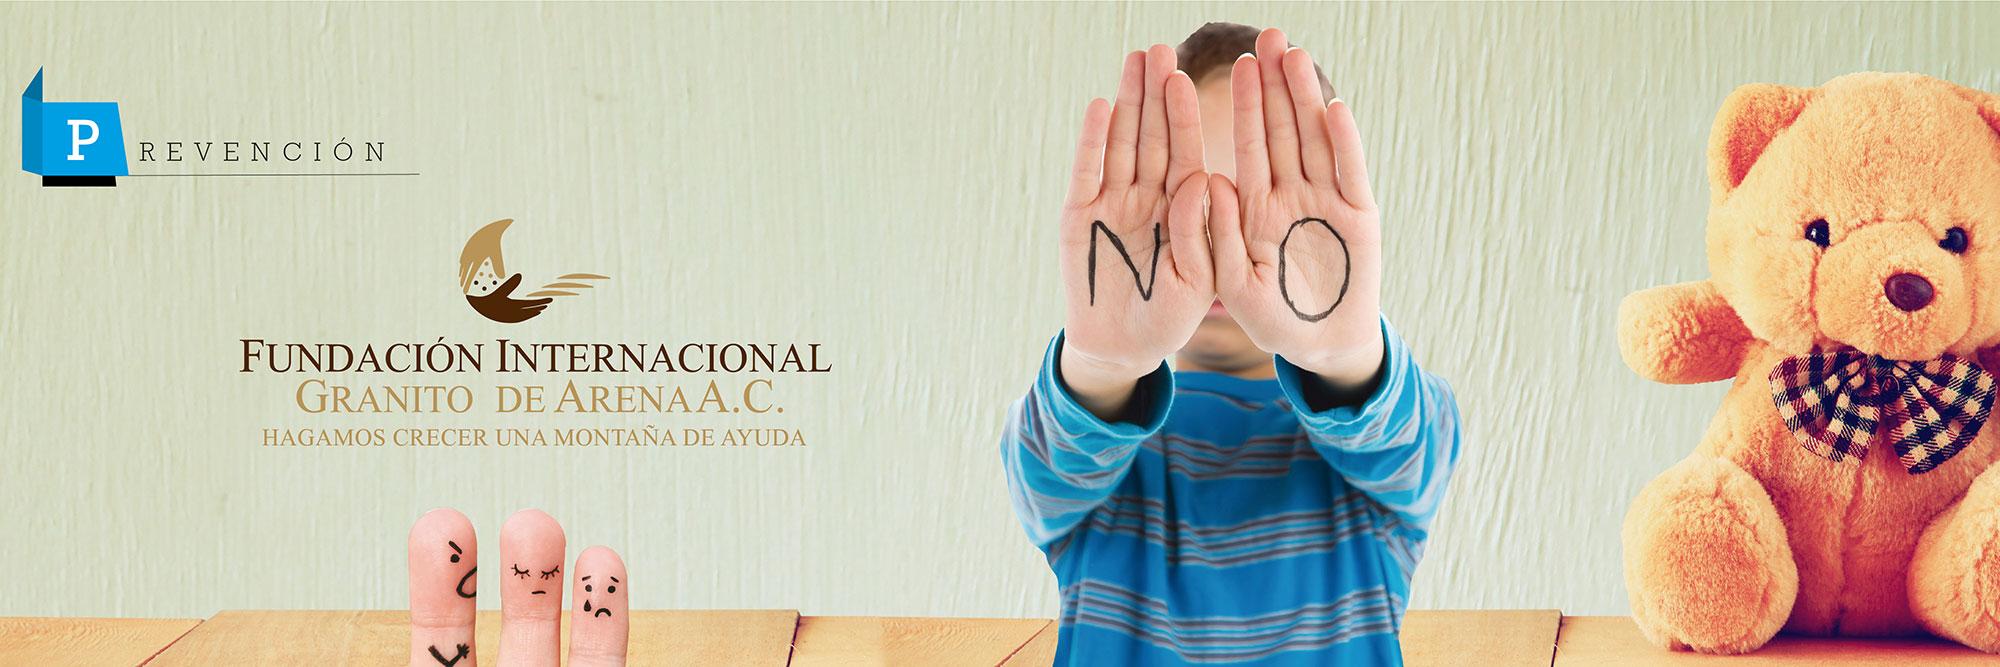 Fundación Internacional Granito de Arena AC Grupo Innova Arte Digital Avisos Efectivos